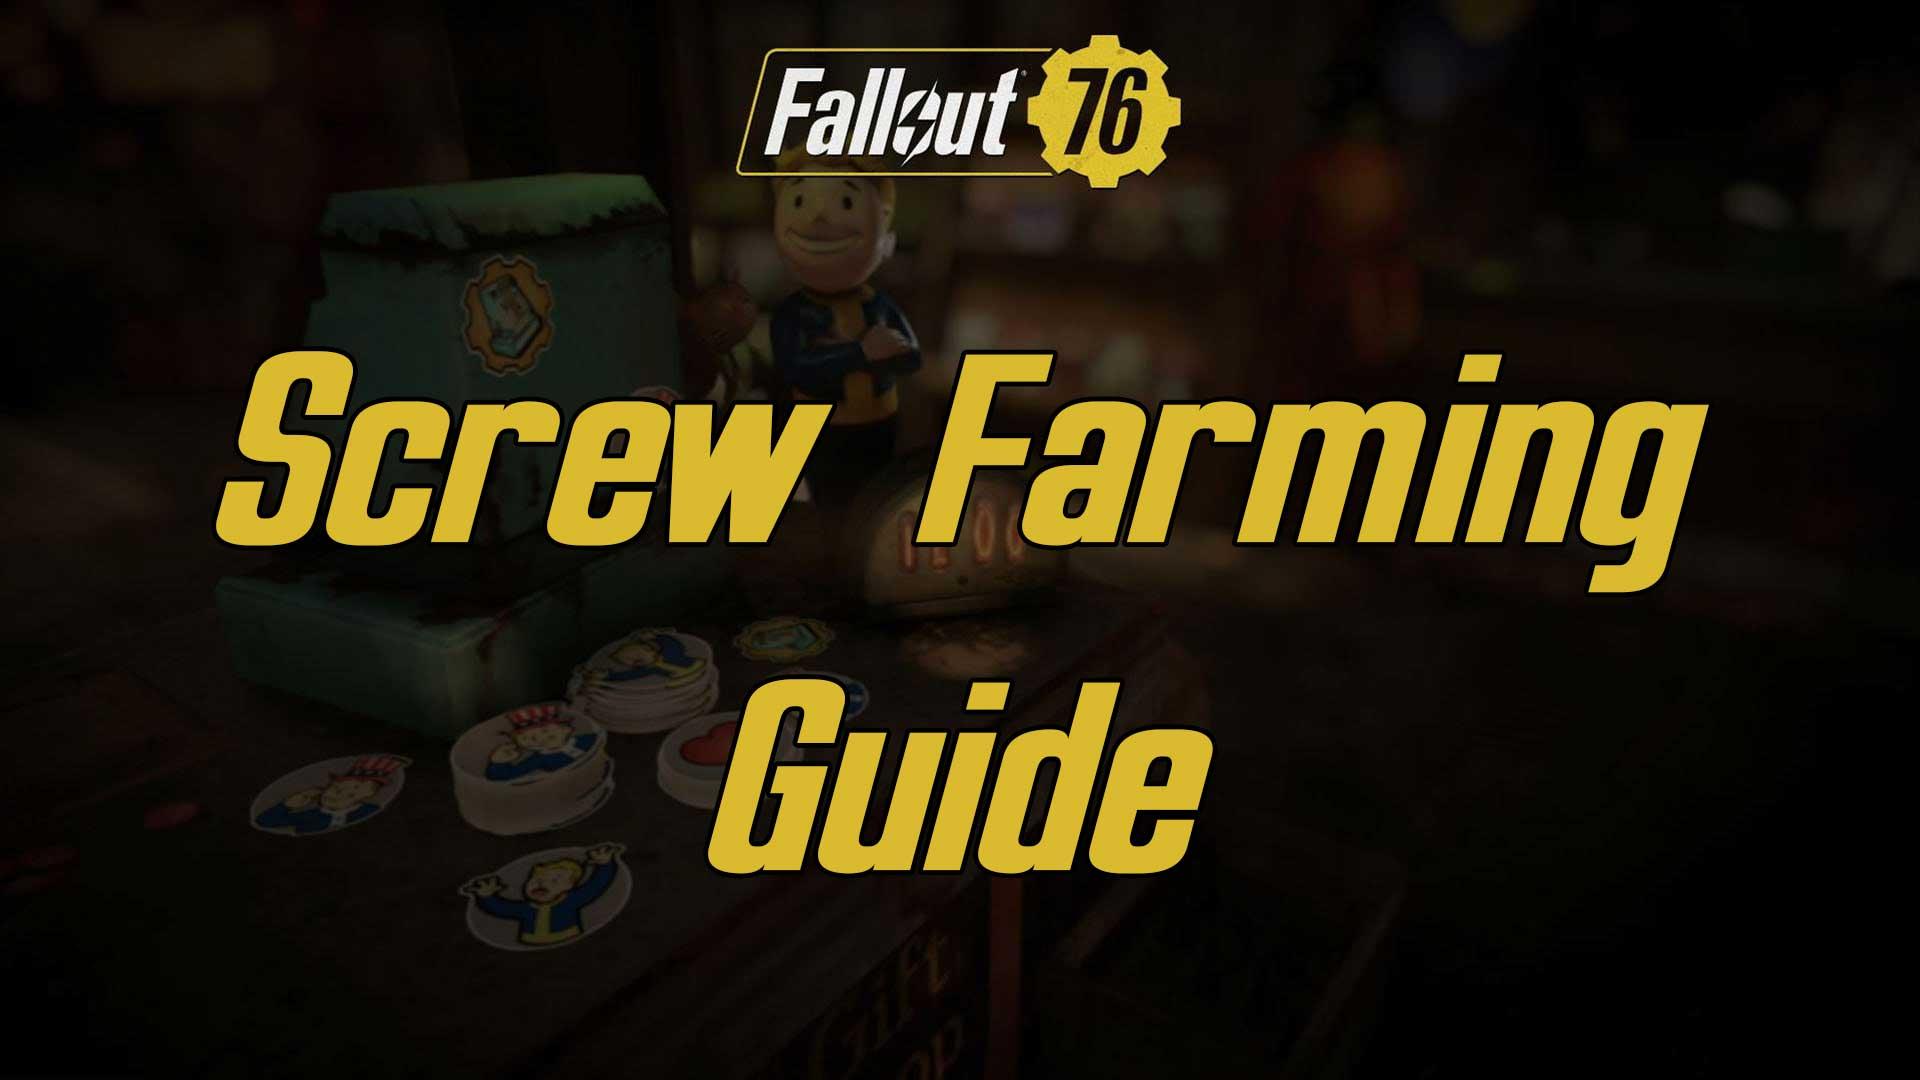 screw farming guide fallout 76